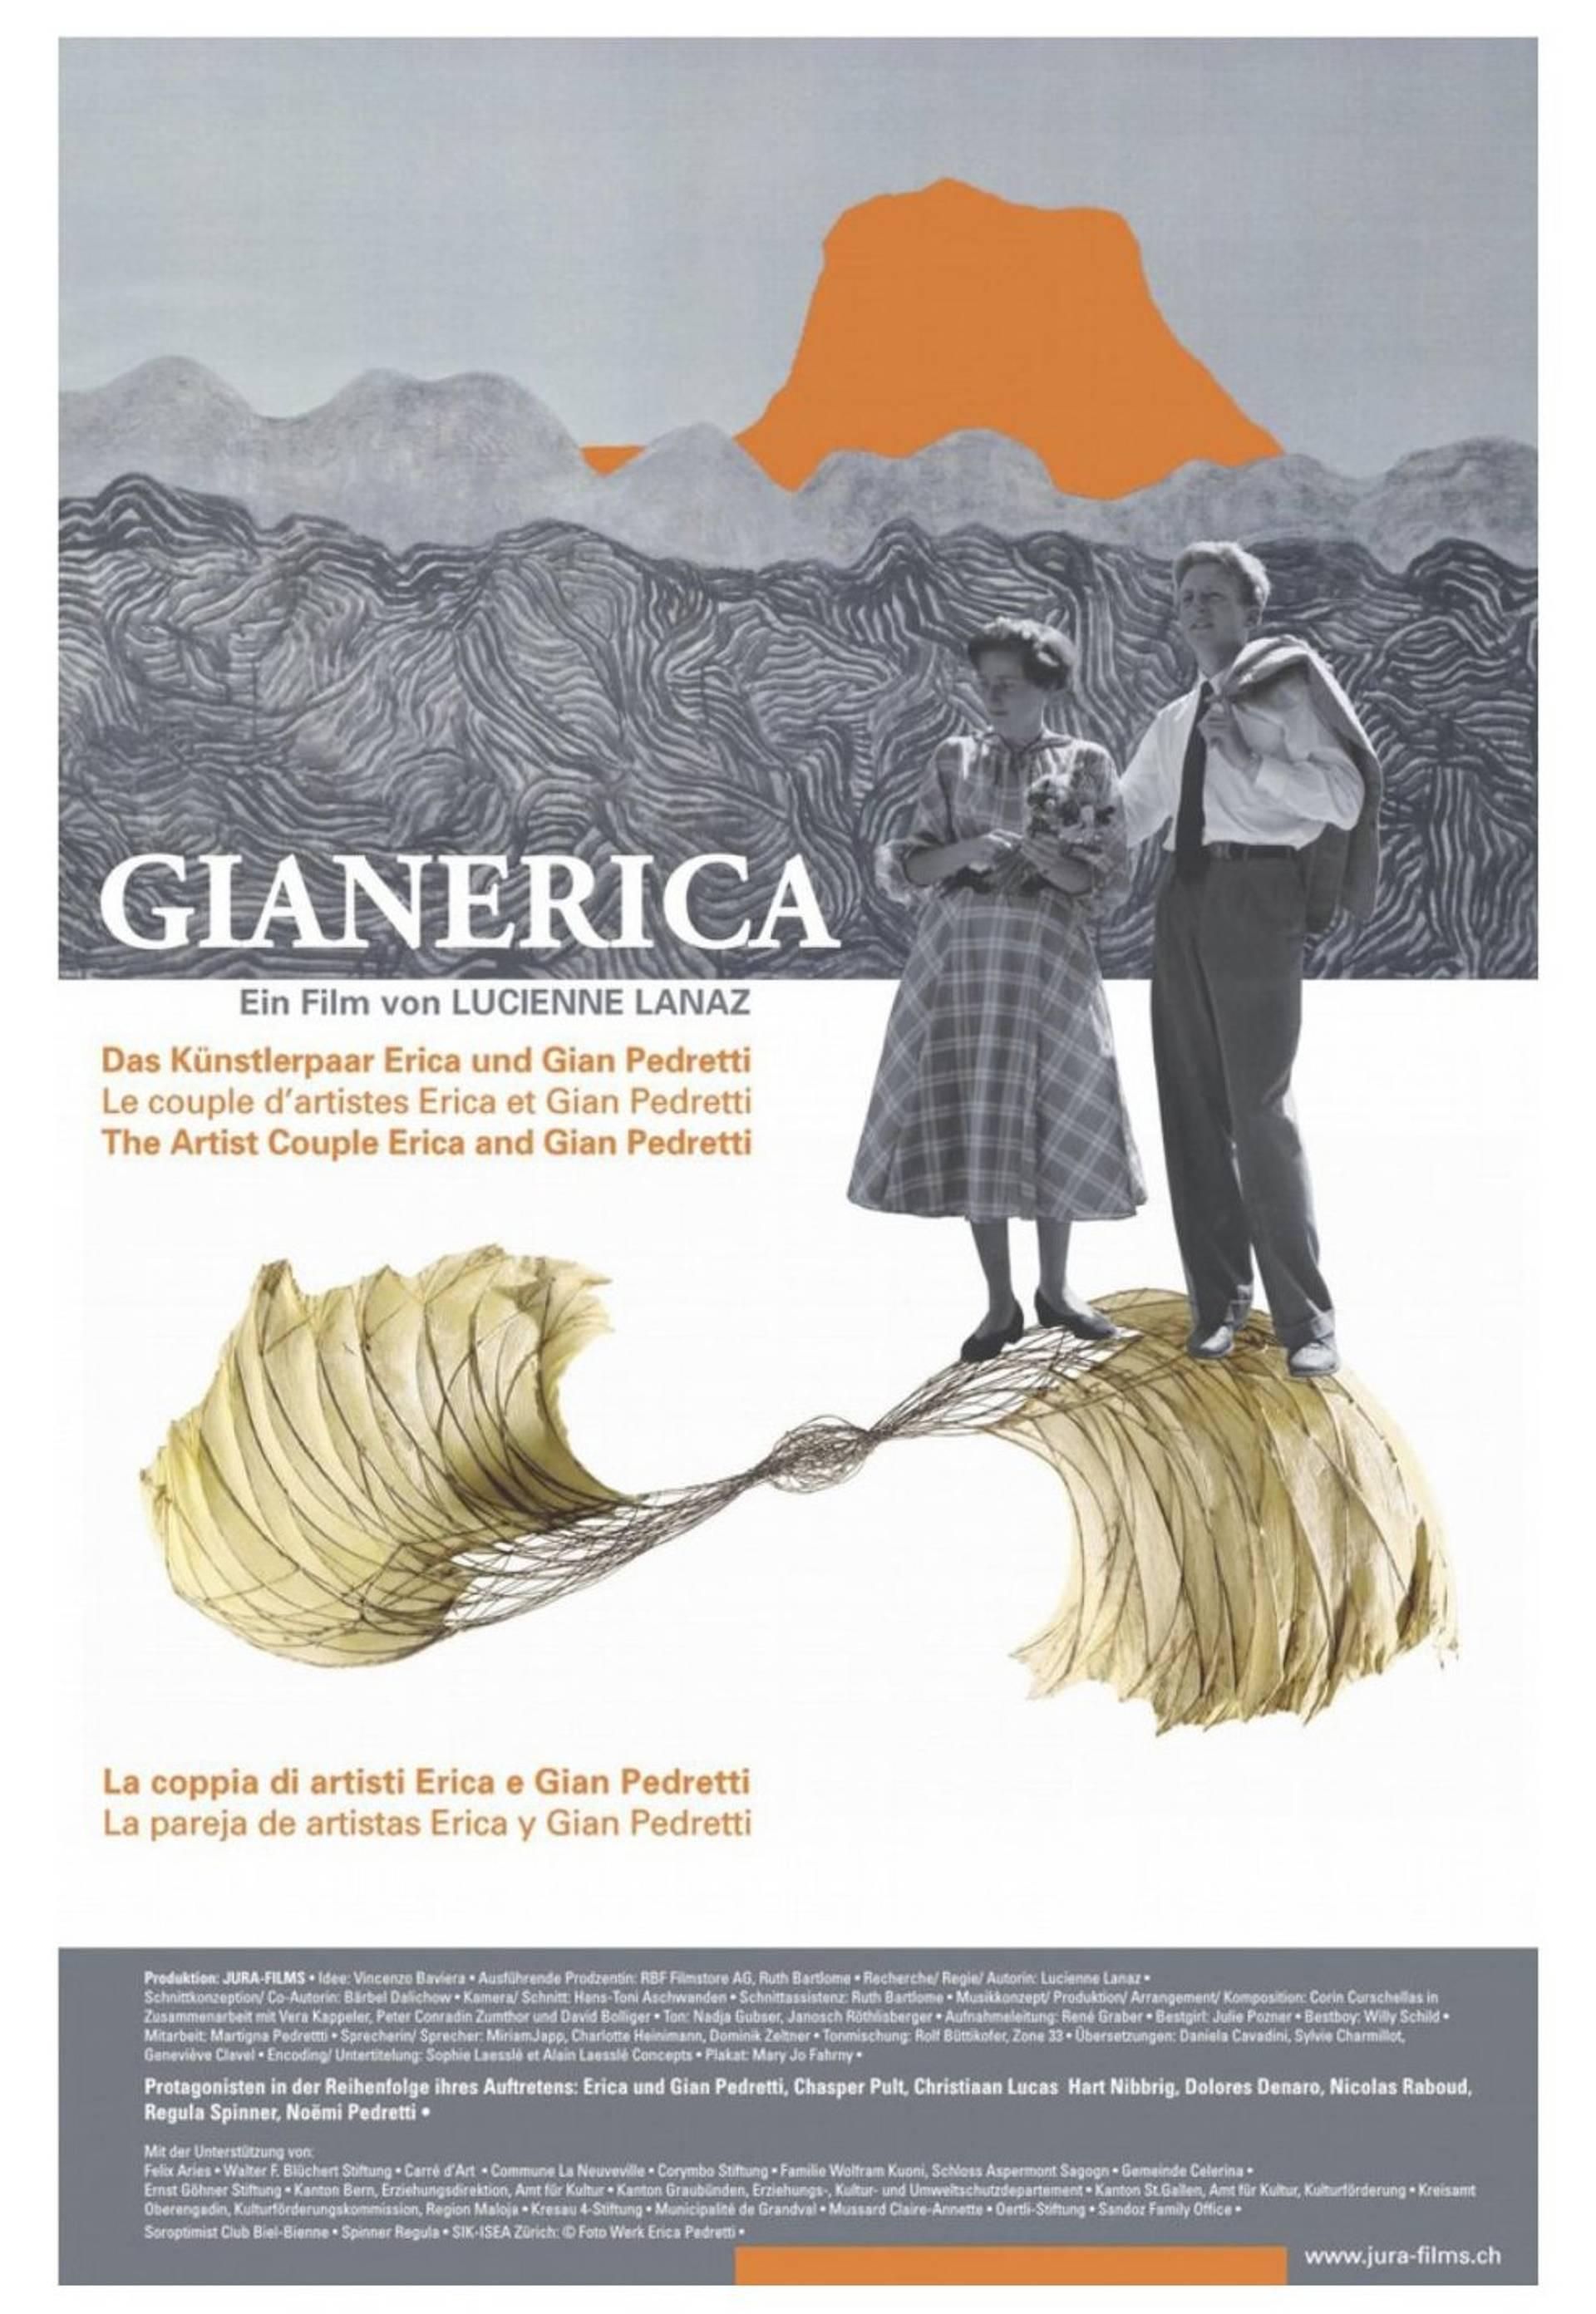 Gianerica